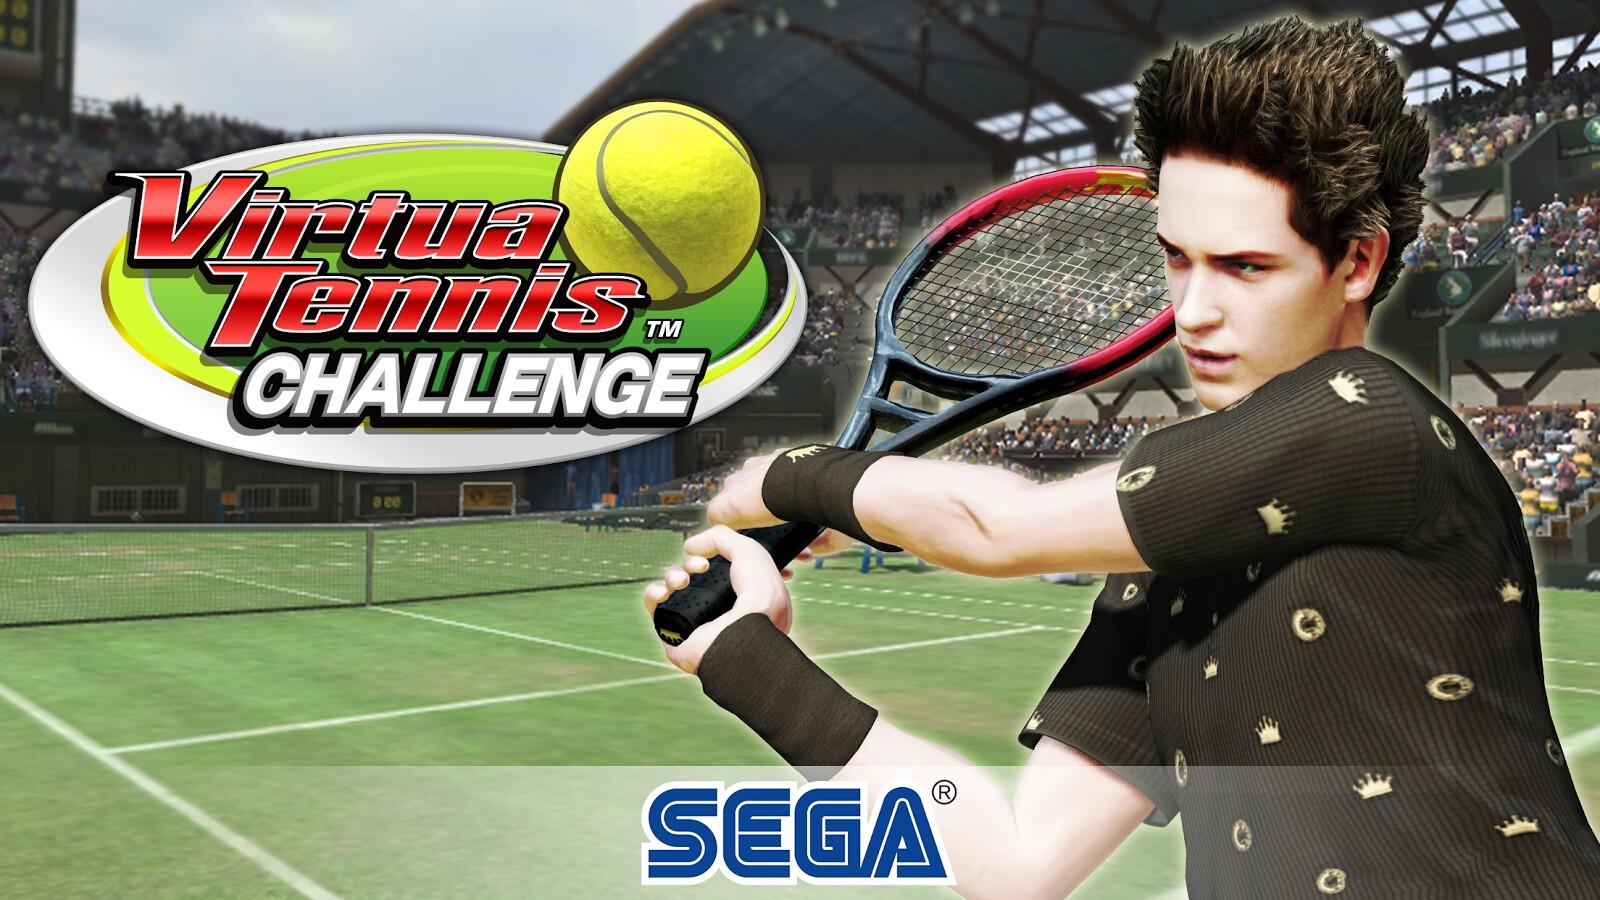 tennis challenge